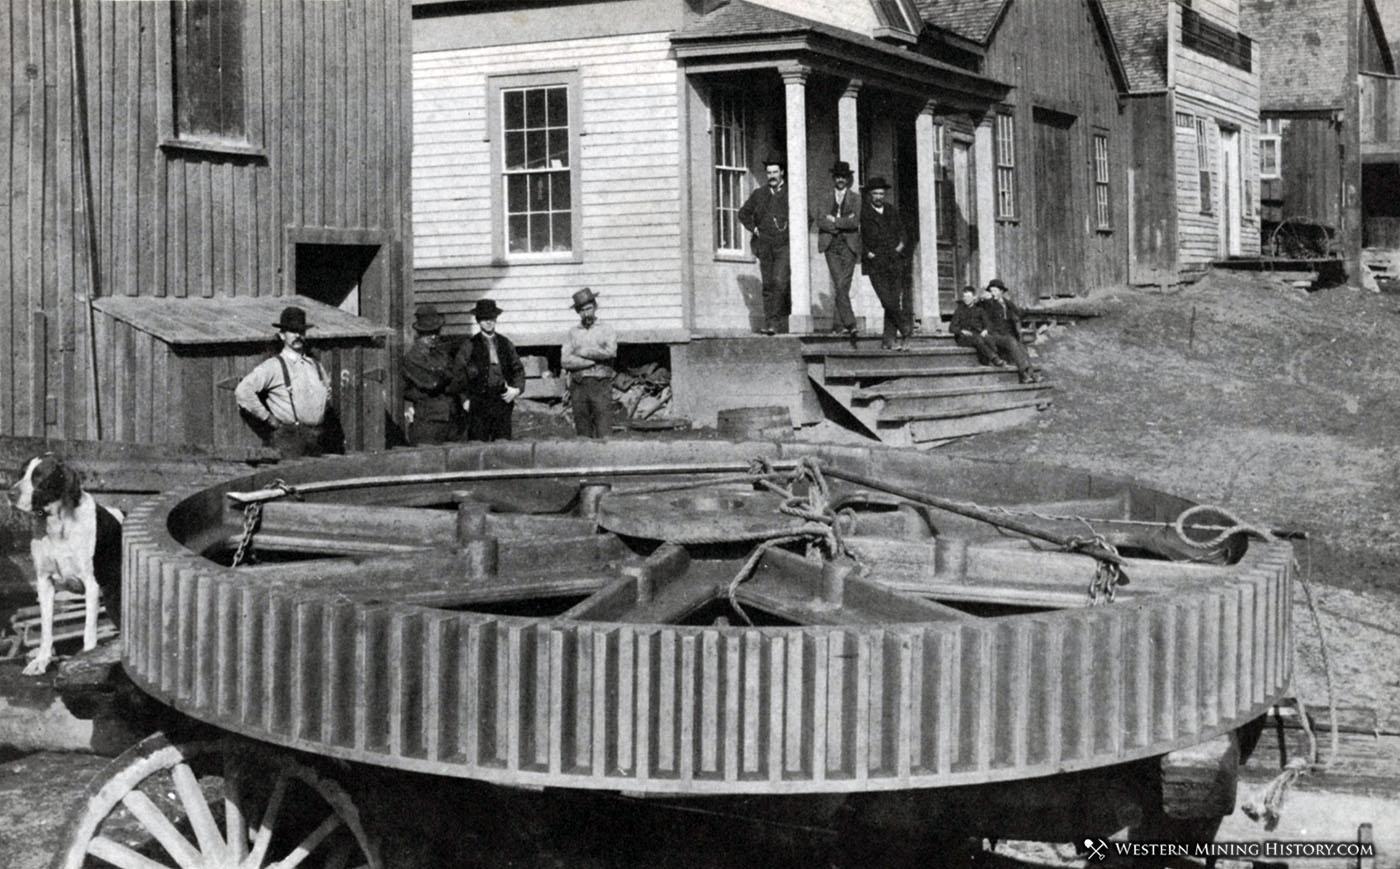 Bull gear leaving the foundry at Virginia City, Nevada ca. 1880s